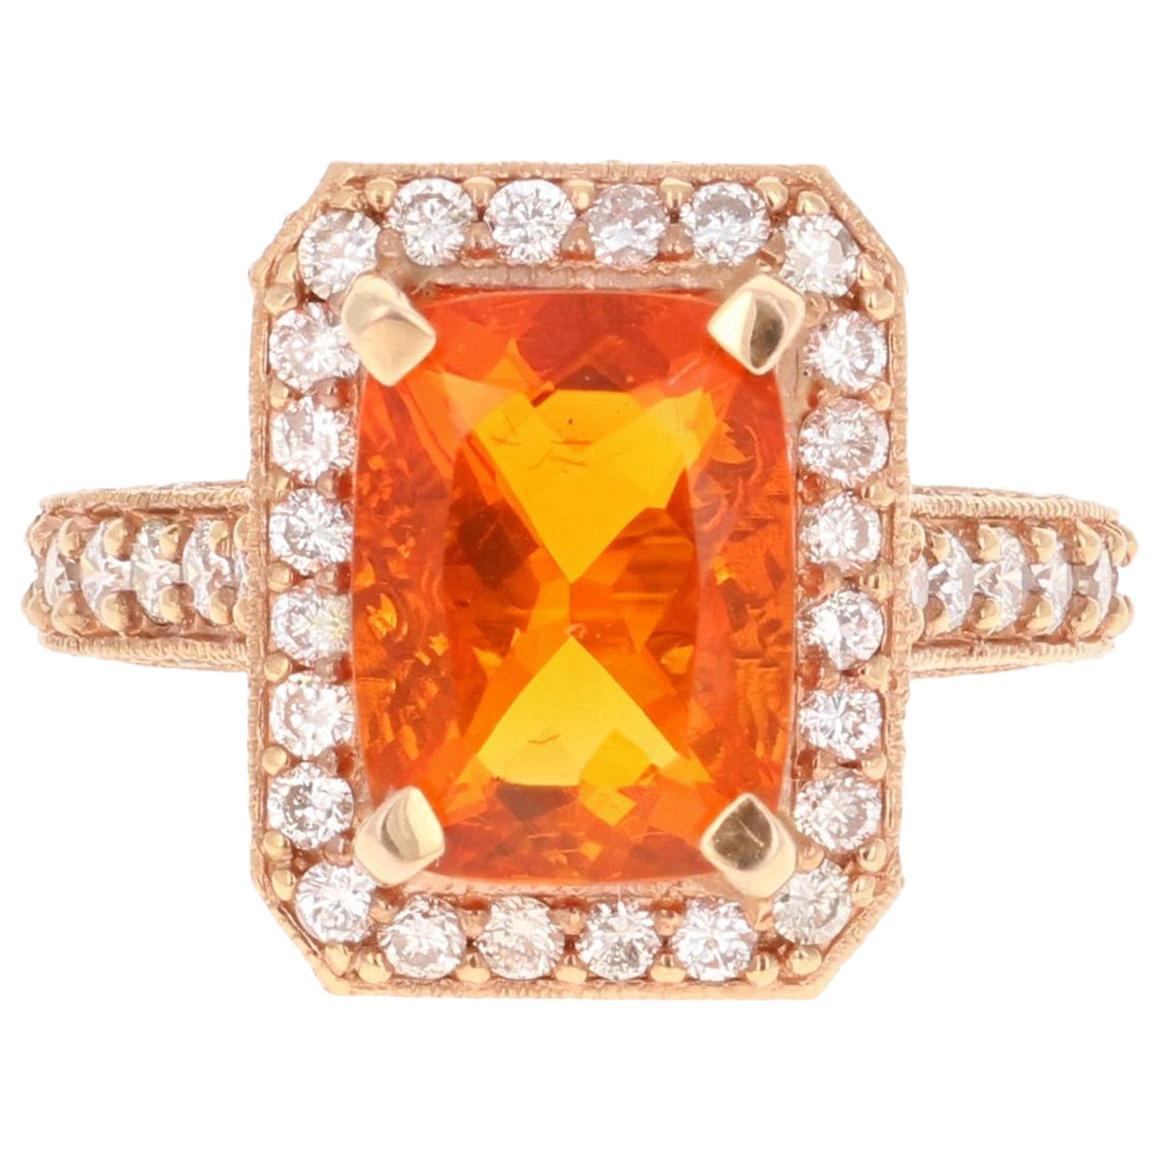 4.29 Carat Fire Opal Diamond 14 Karat Rose Gold Cocktail Ring